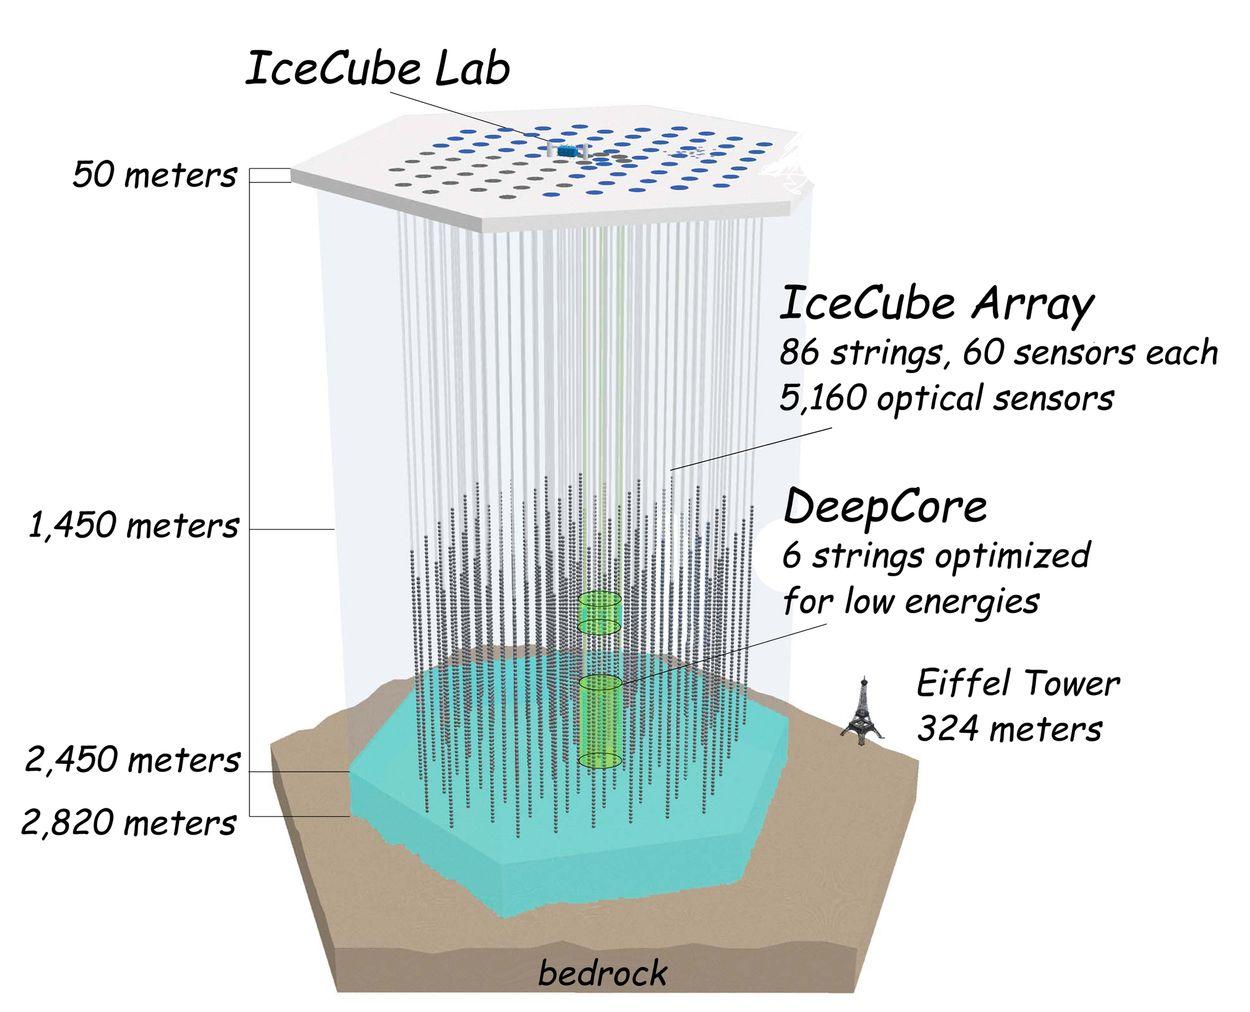 IceCube: World's largest neutrino observatory completed at ...Icecube Neutrino Observatory Core